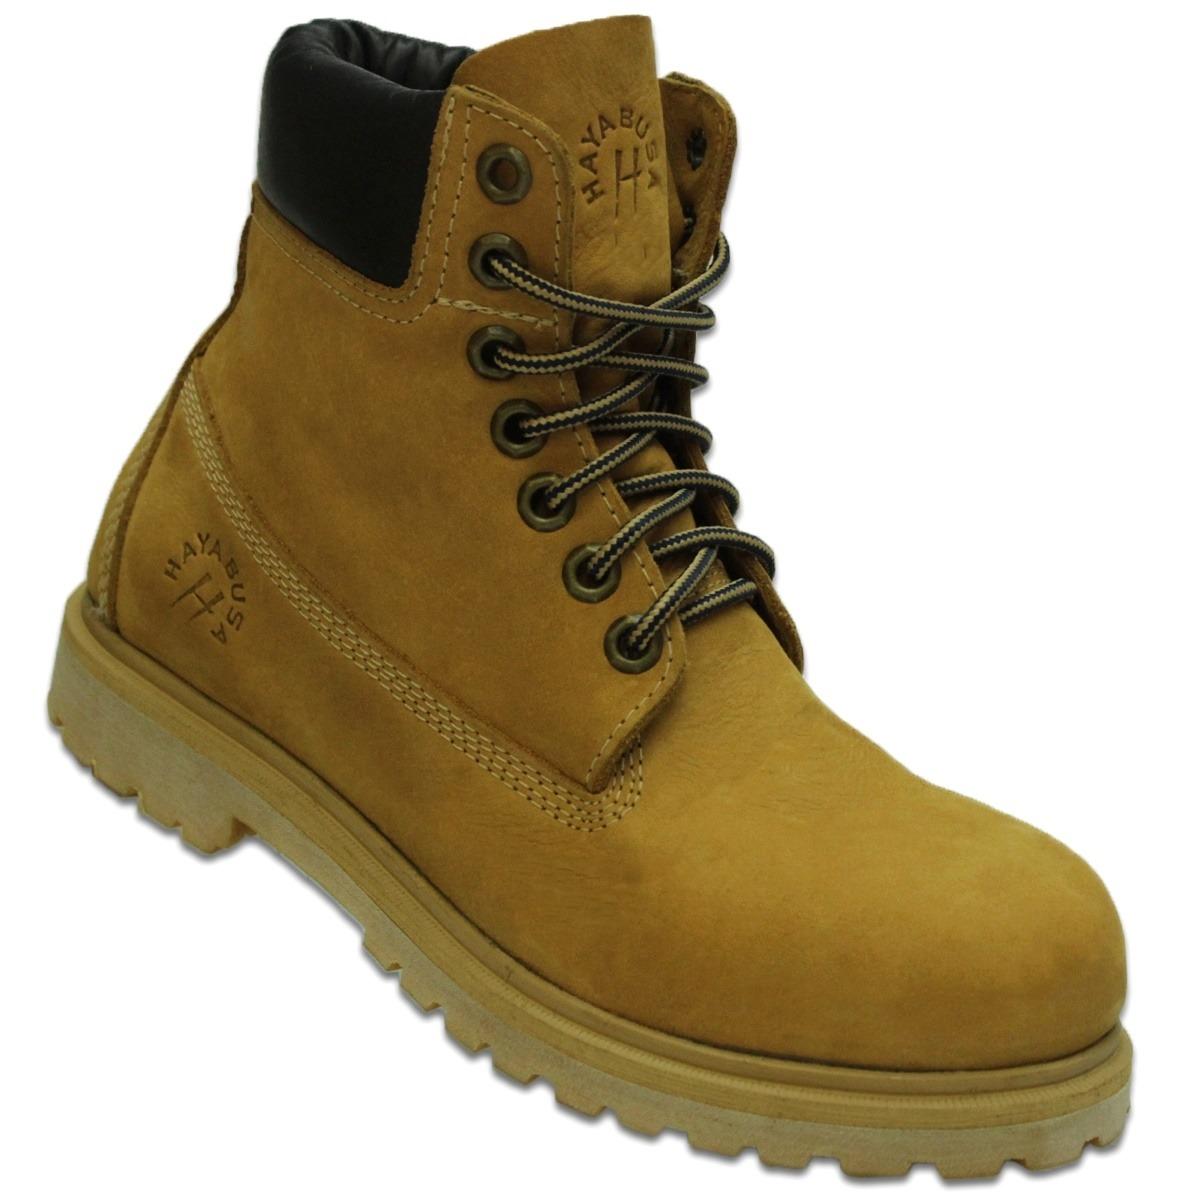 dc8e6f45 Bota Yellow Boot Hidro 10 - Hayabusa - R$ 249,90 em Mercado Livre